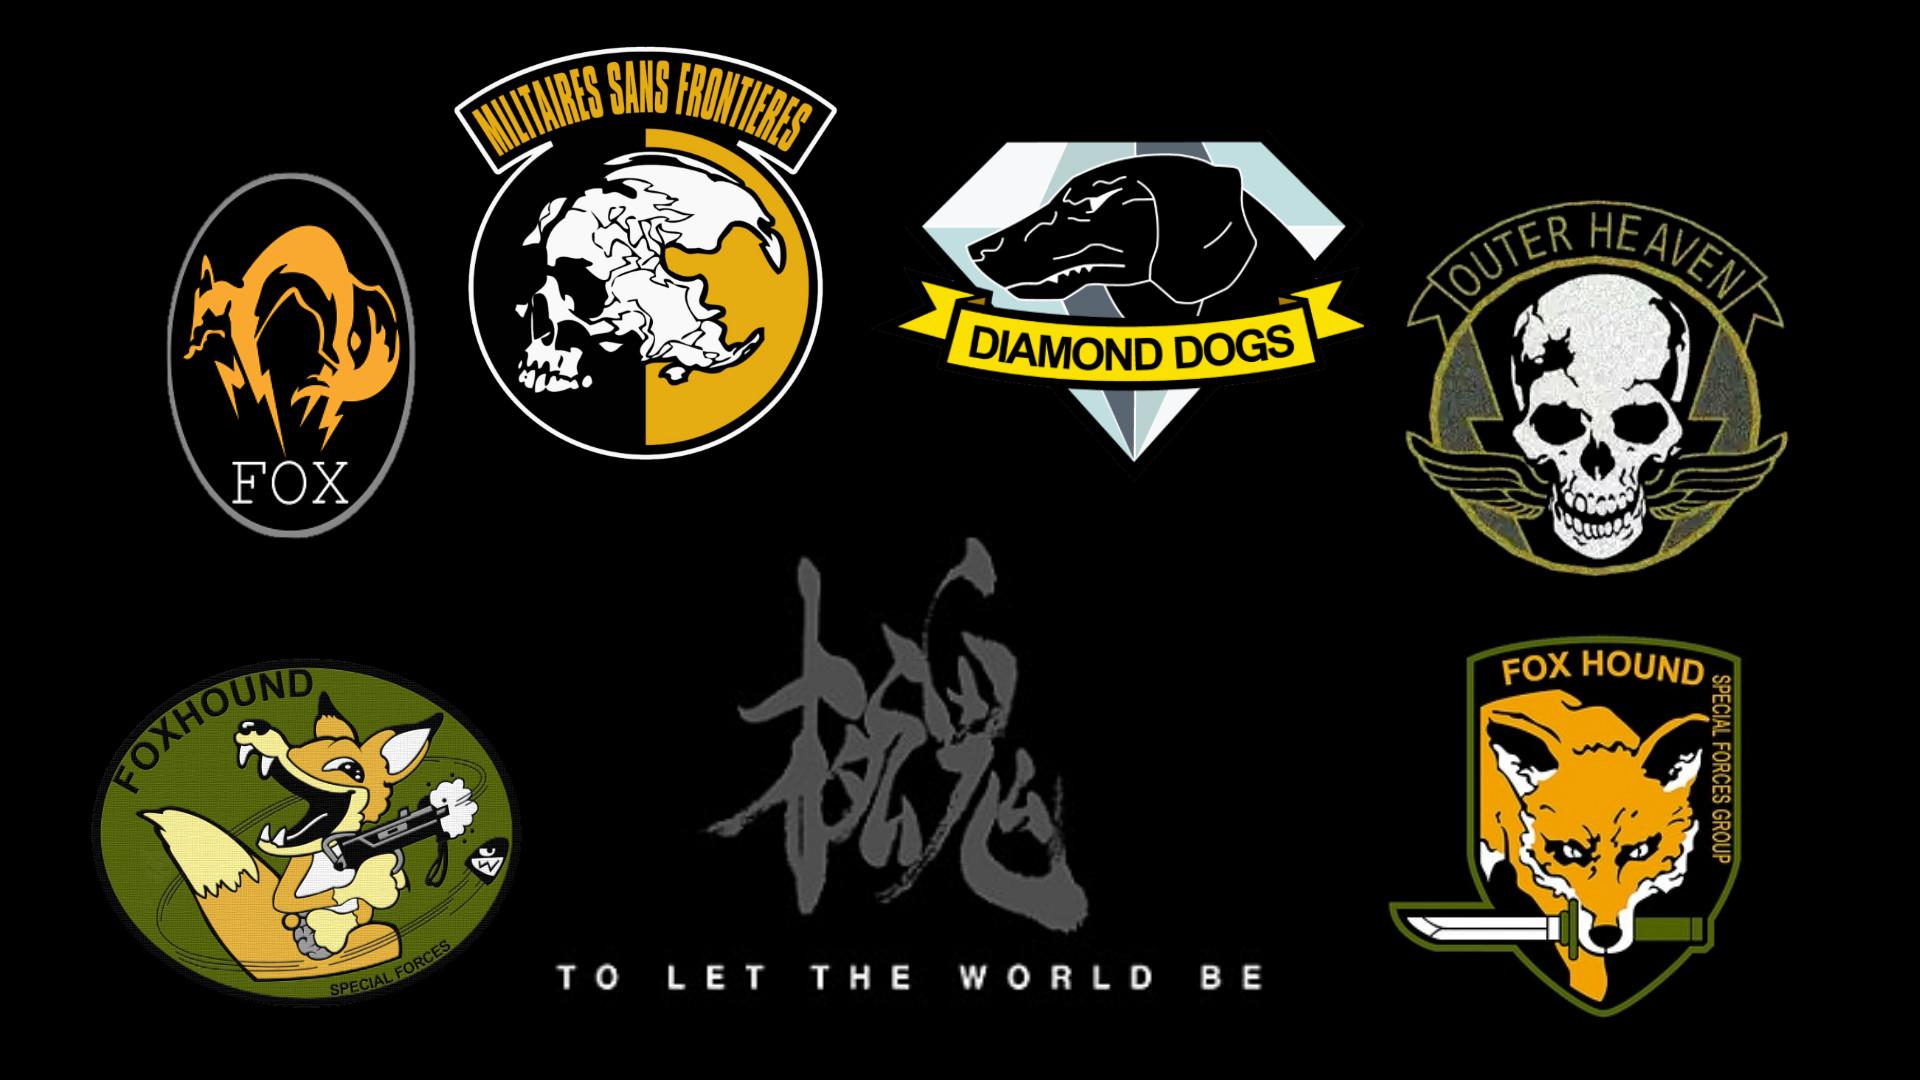 Foxhound Logo Wallpaper Hd